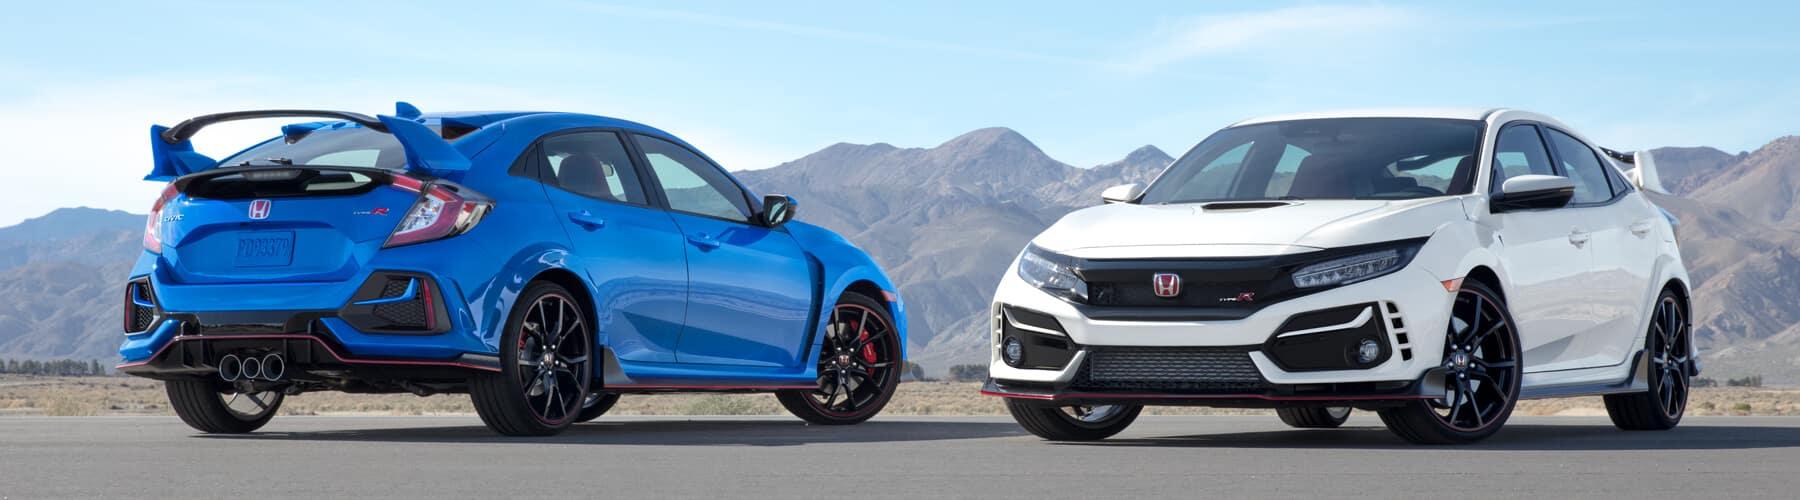 2020 Honda Civic Type R Slider